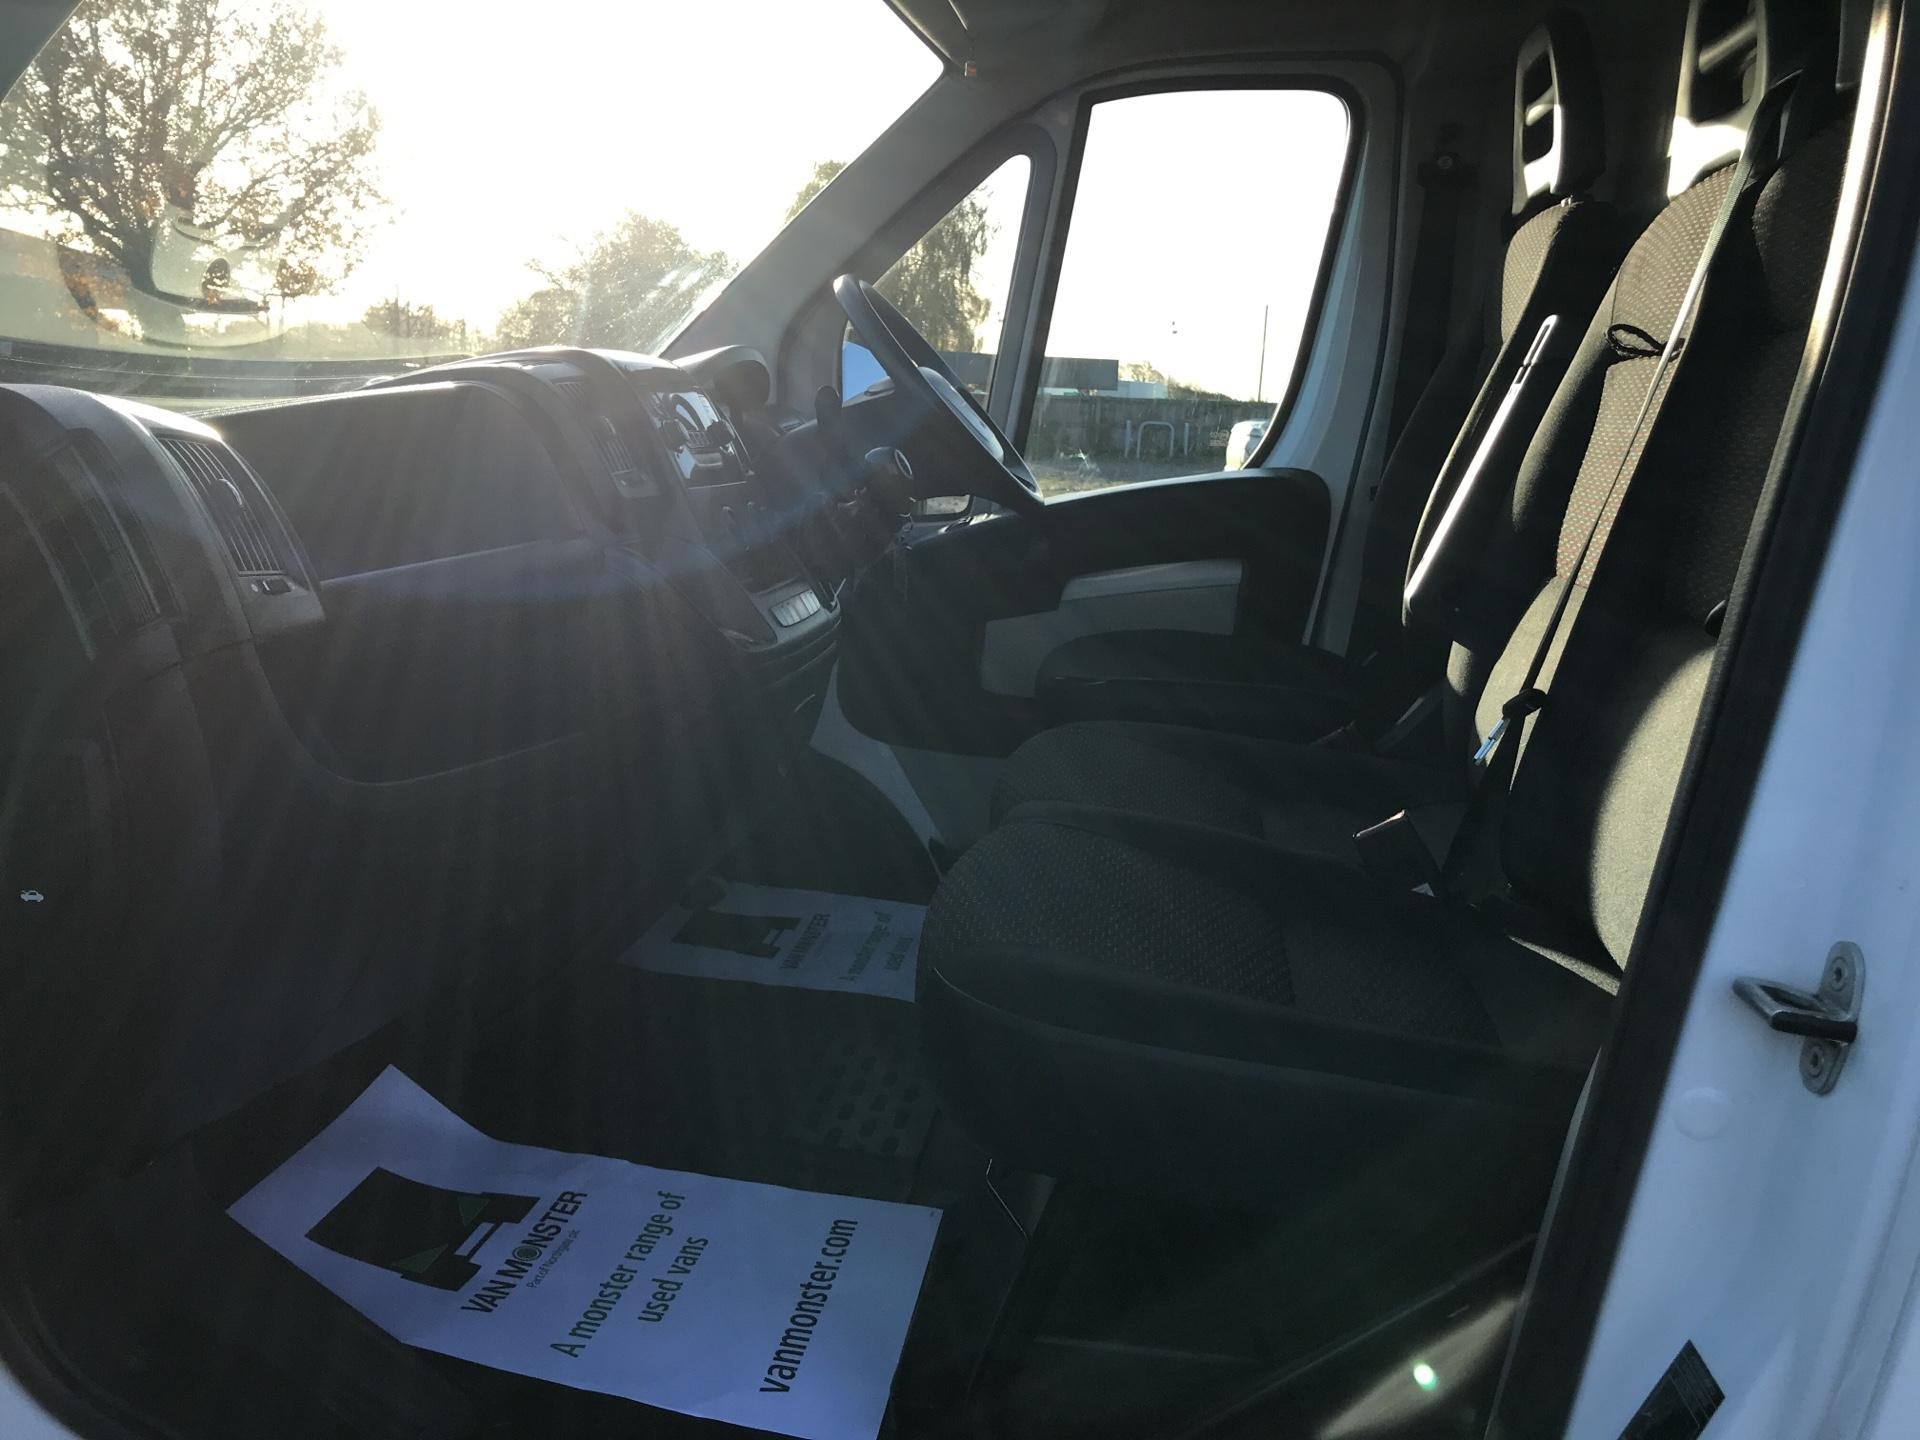 2015 Peugeot Boxer 2.2 Hdi H2 Van 130Ps Euro 5 (NU65TVM) Image 14